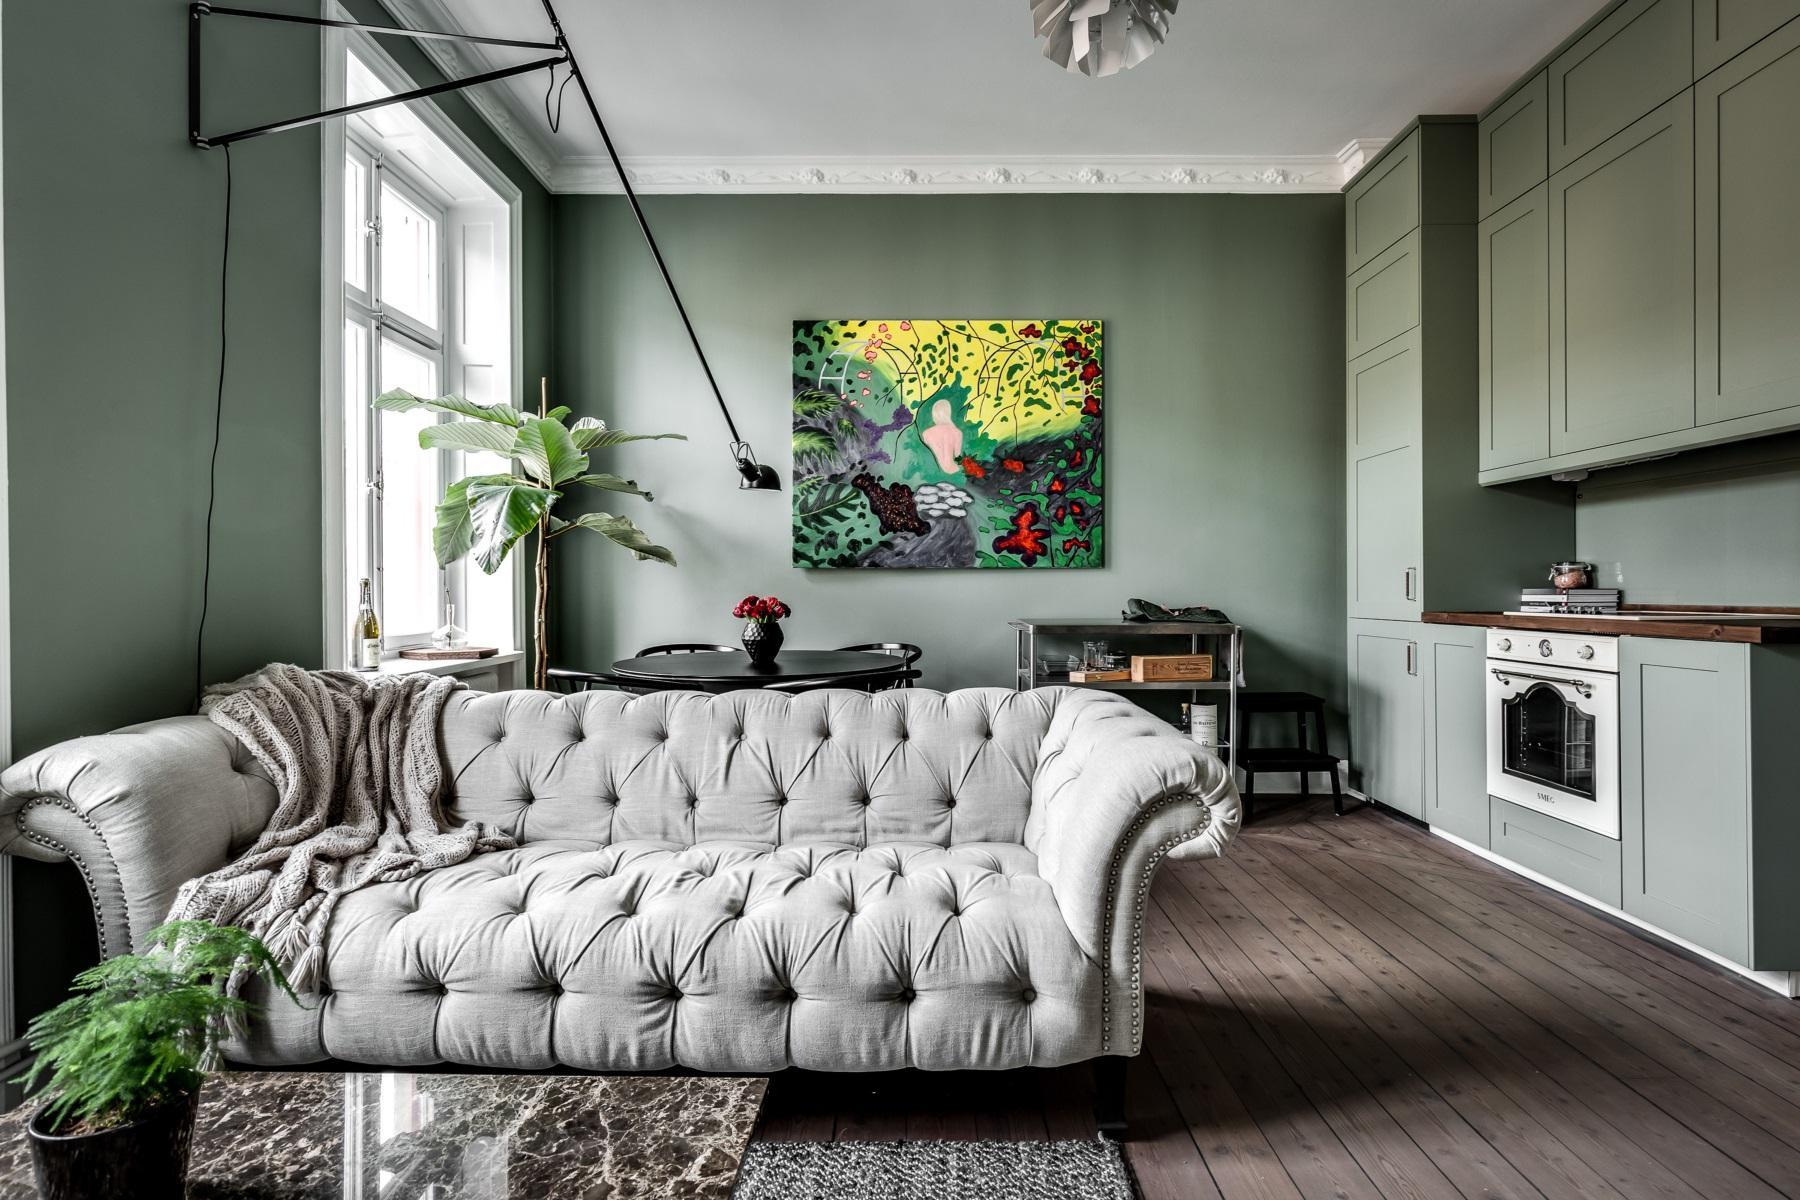 Deco ambientaci n en verde agua virlova style - Deco grijze muur ...